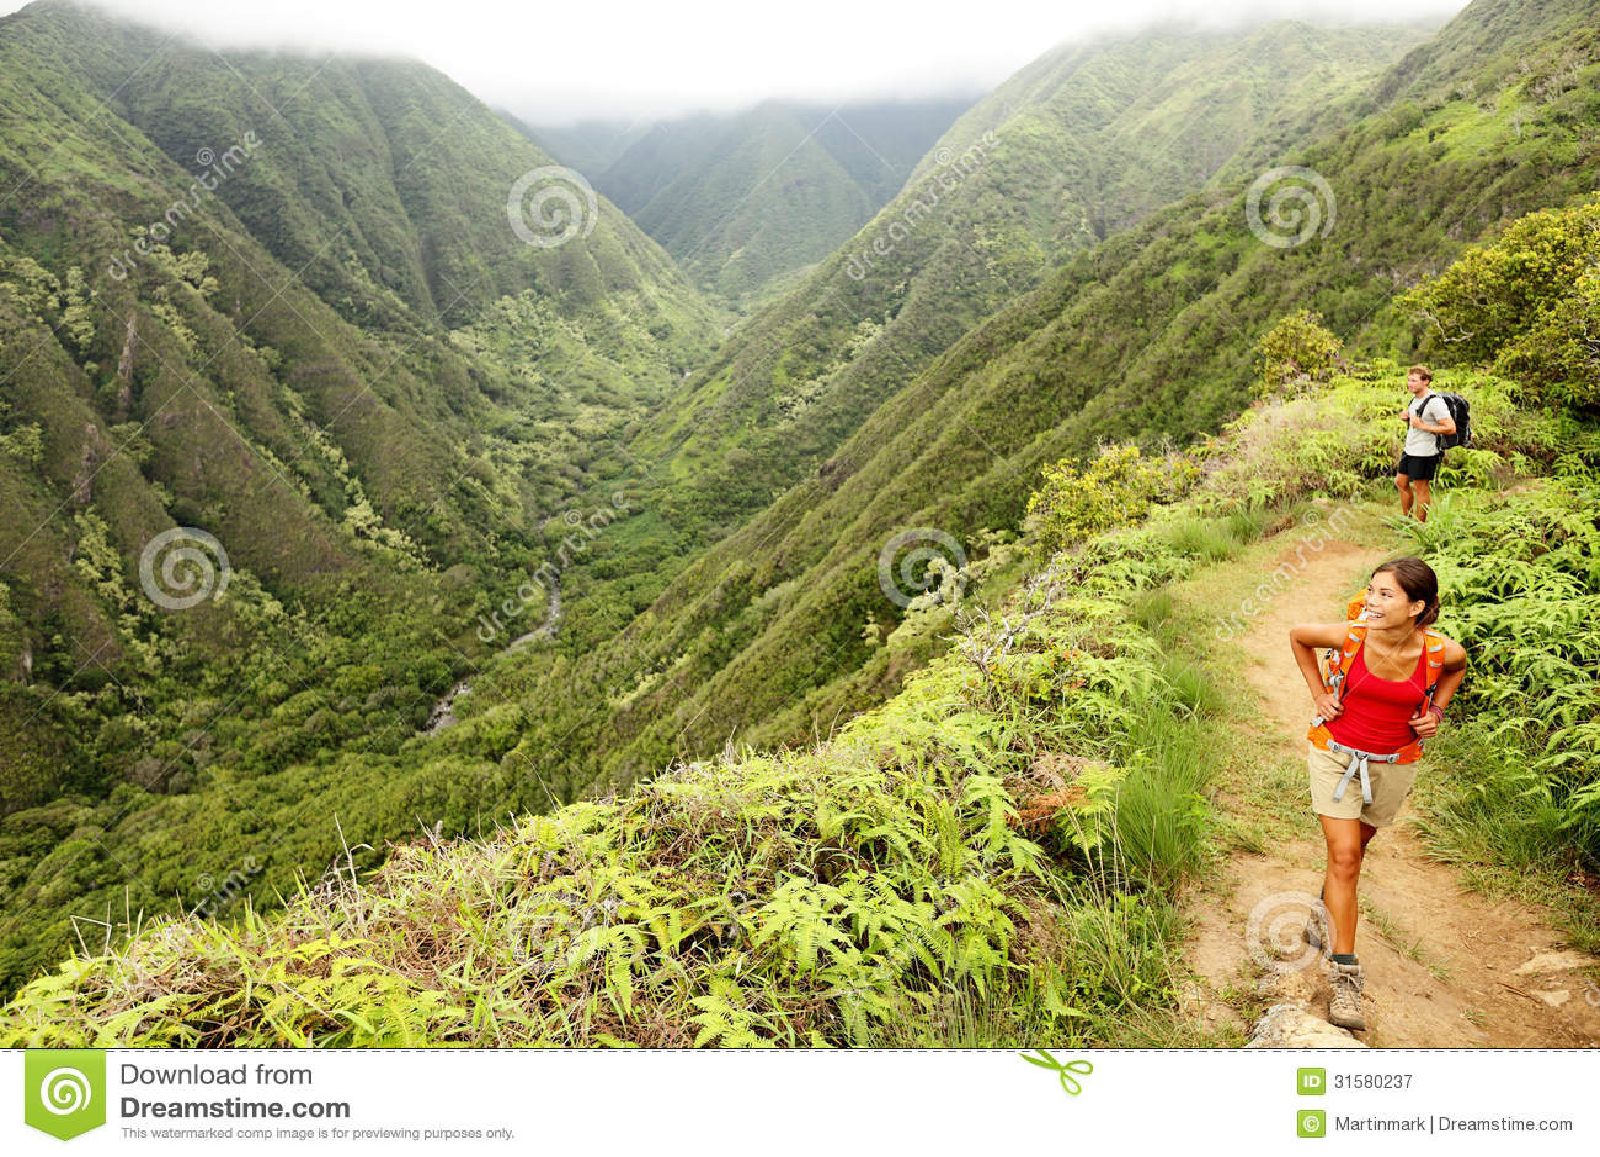 Hiking People On Hawaii Waihee Ridge Trail Maui Stock